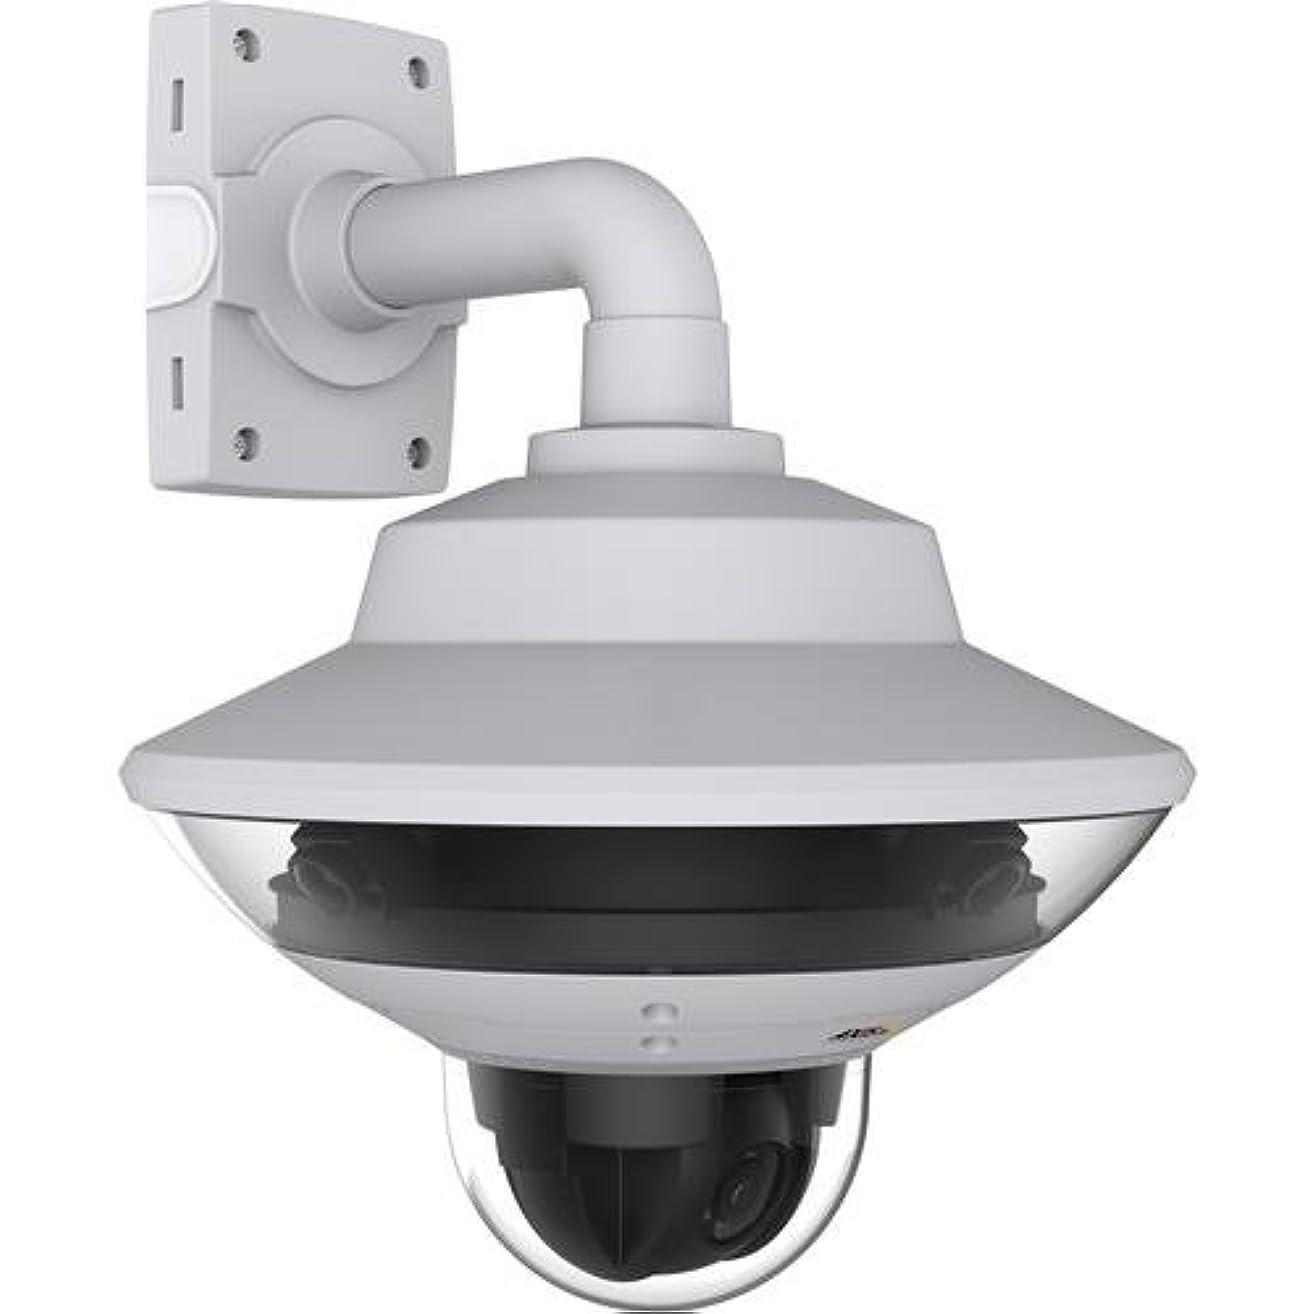 AXIS PTZ Network Camera